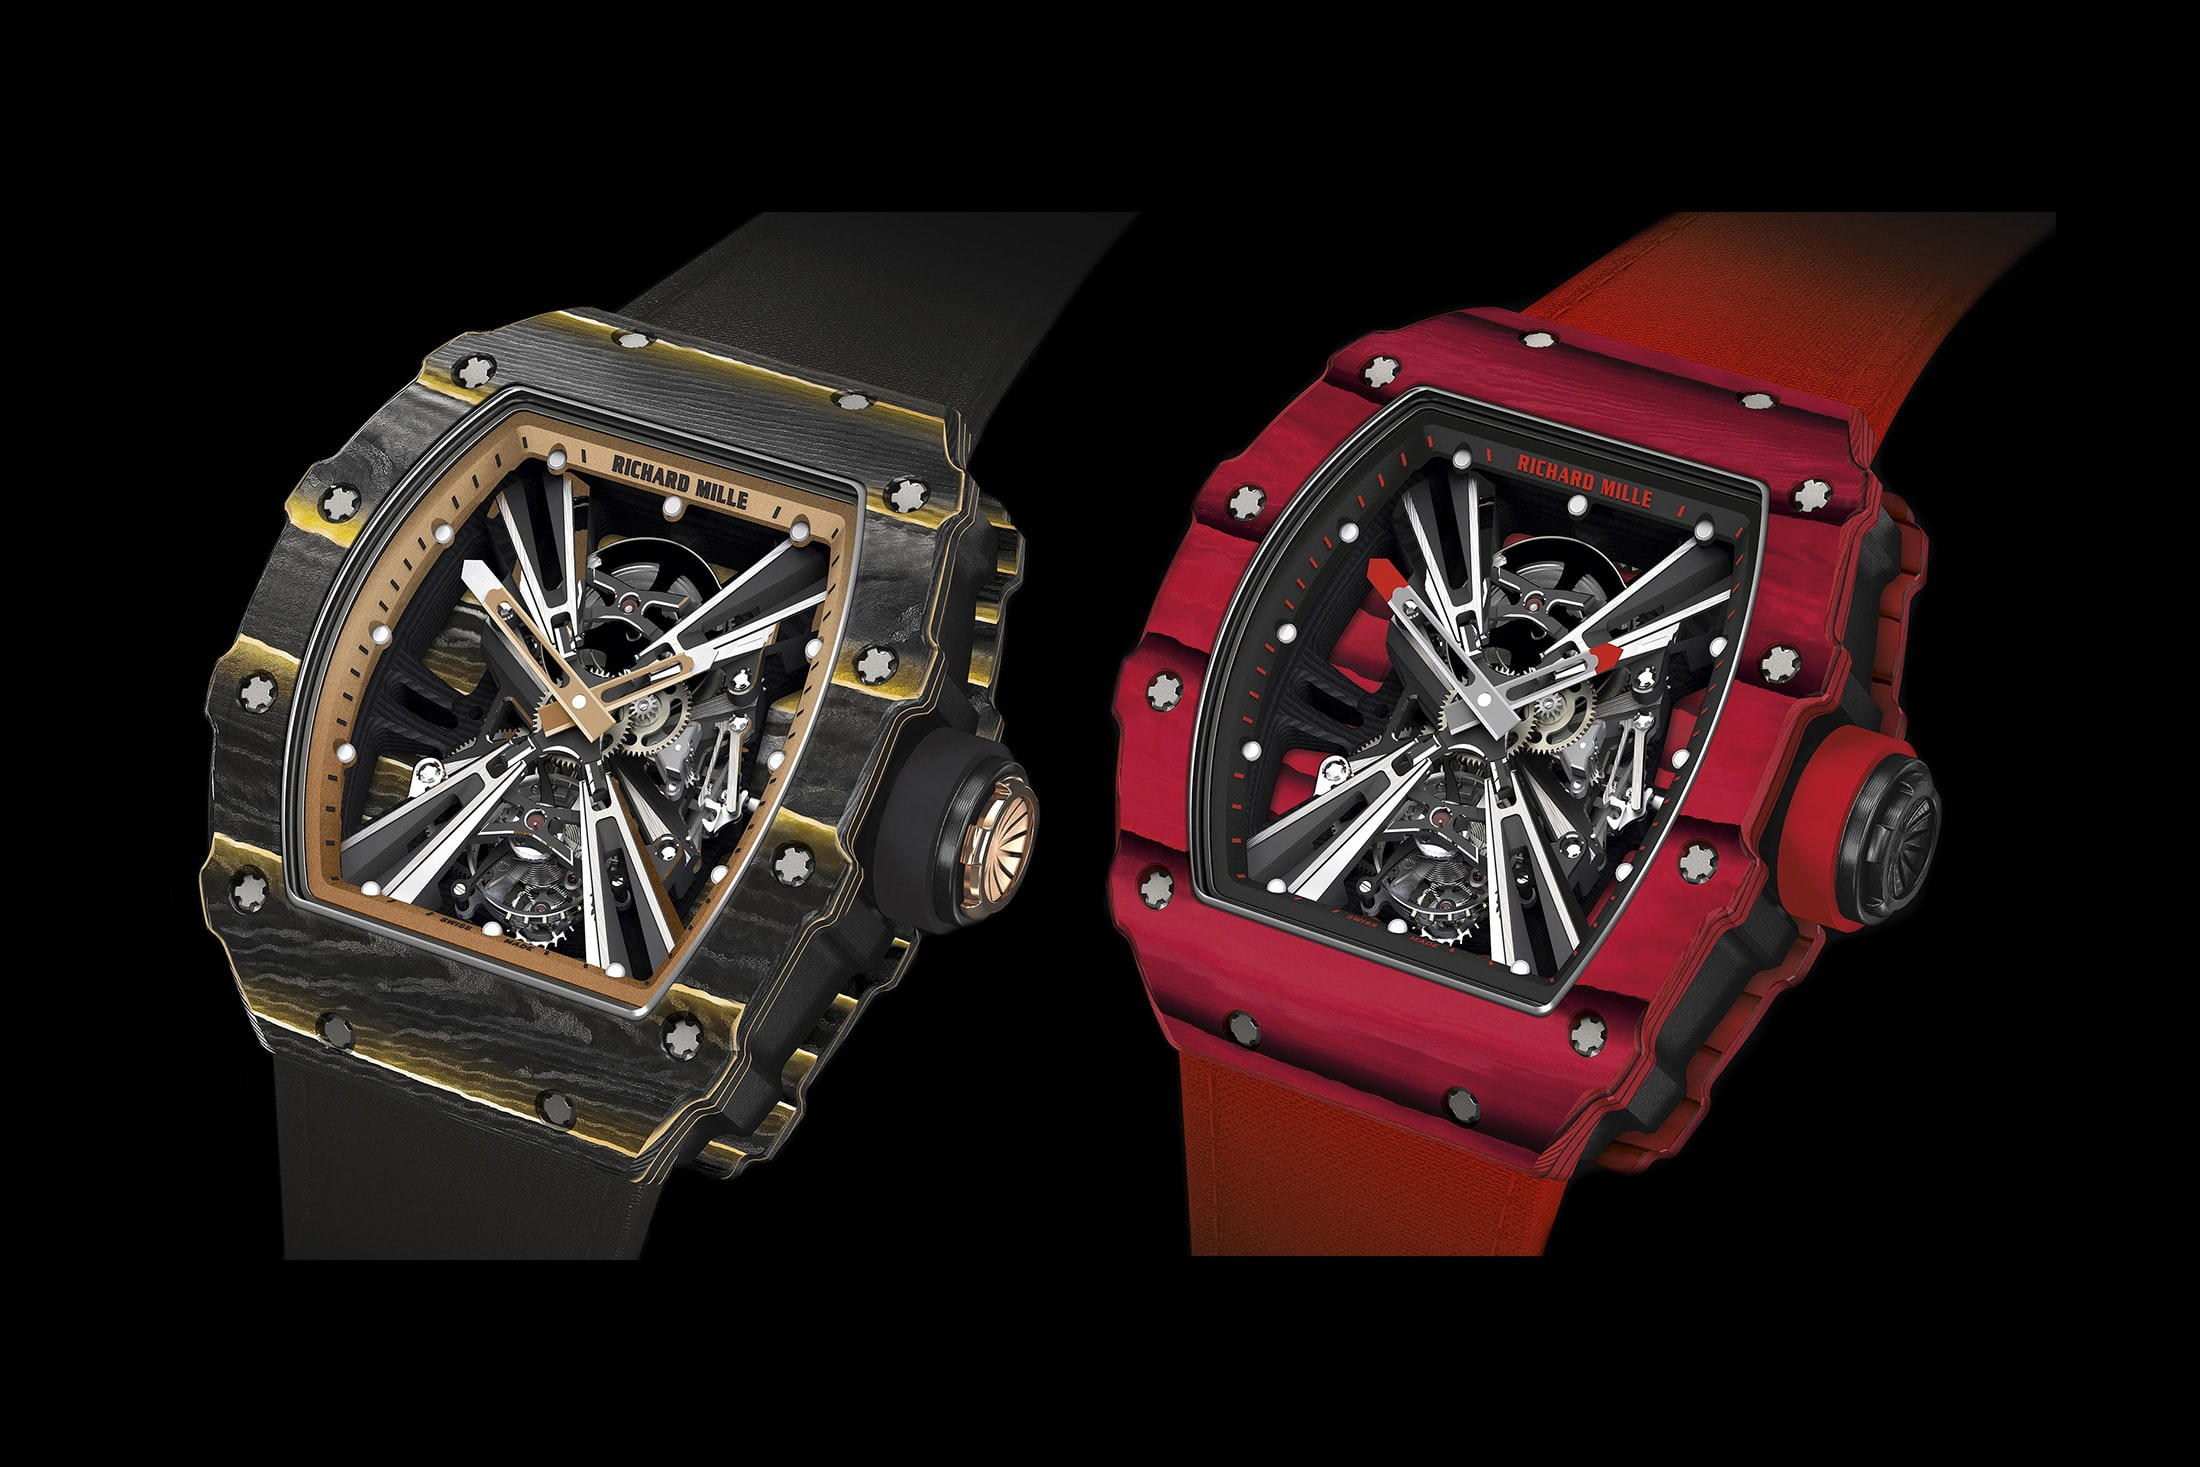 Introducing: The Richard Mille RM 12-01 Tourbillon RM 12 01 pair